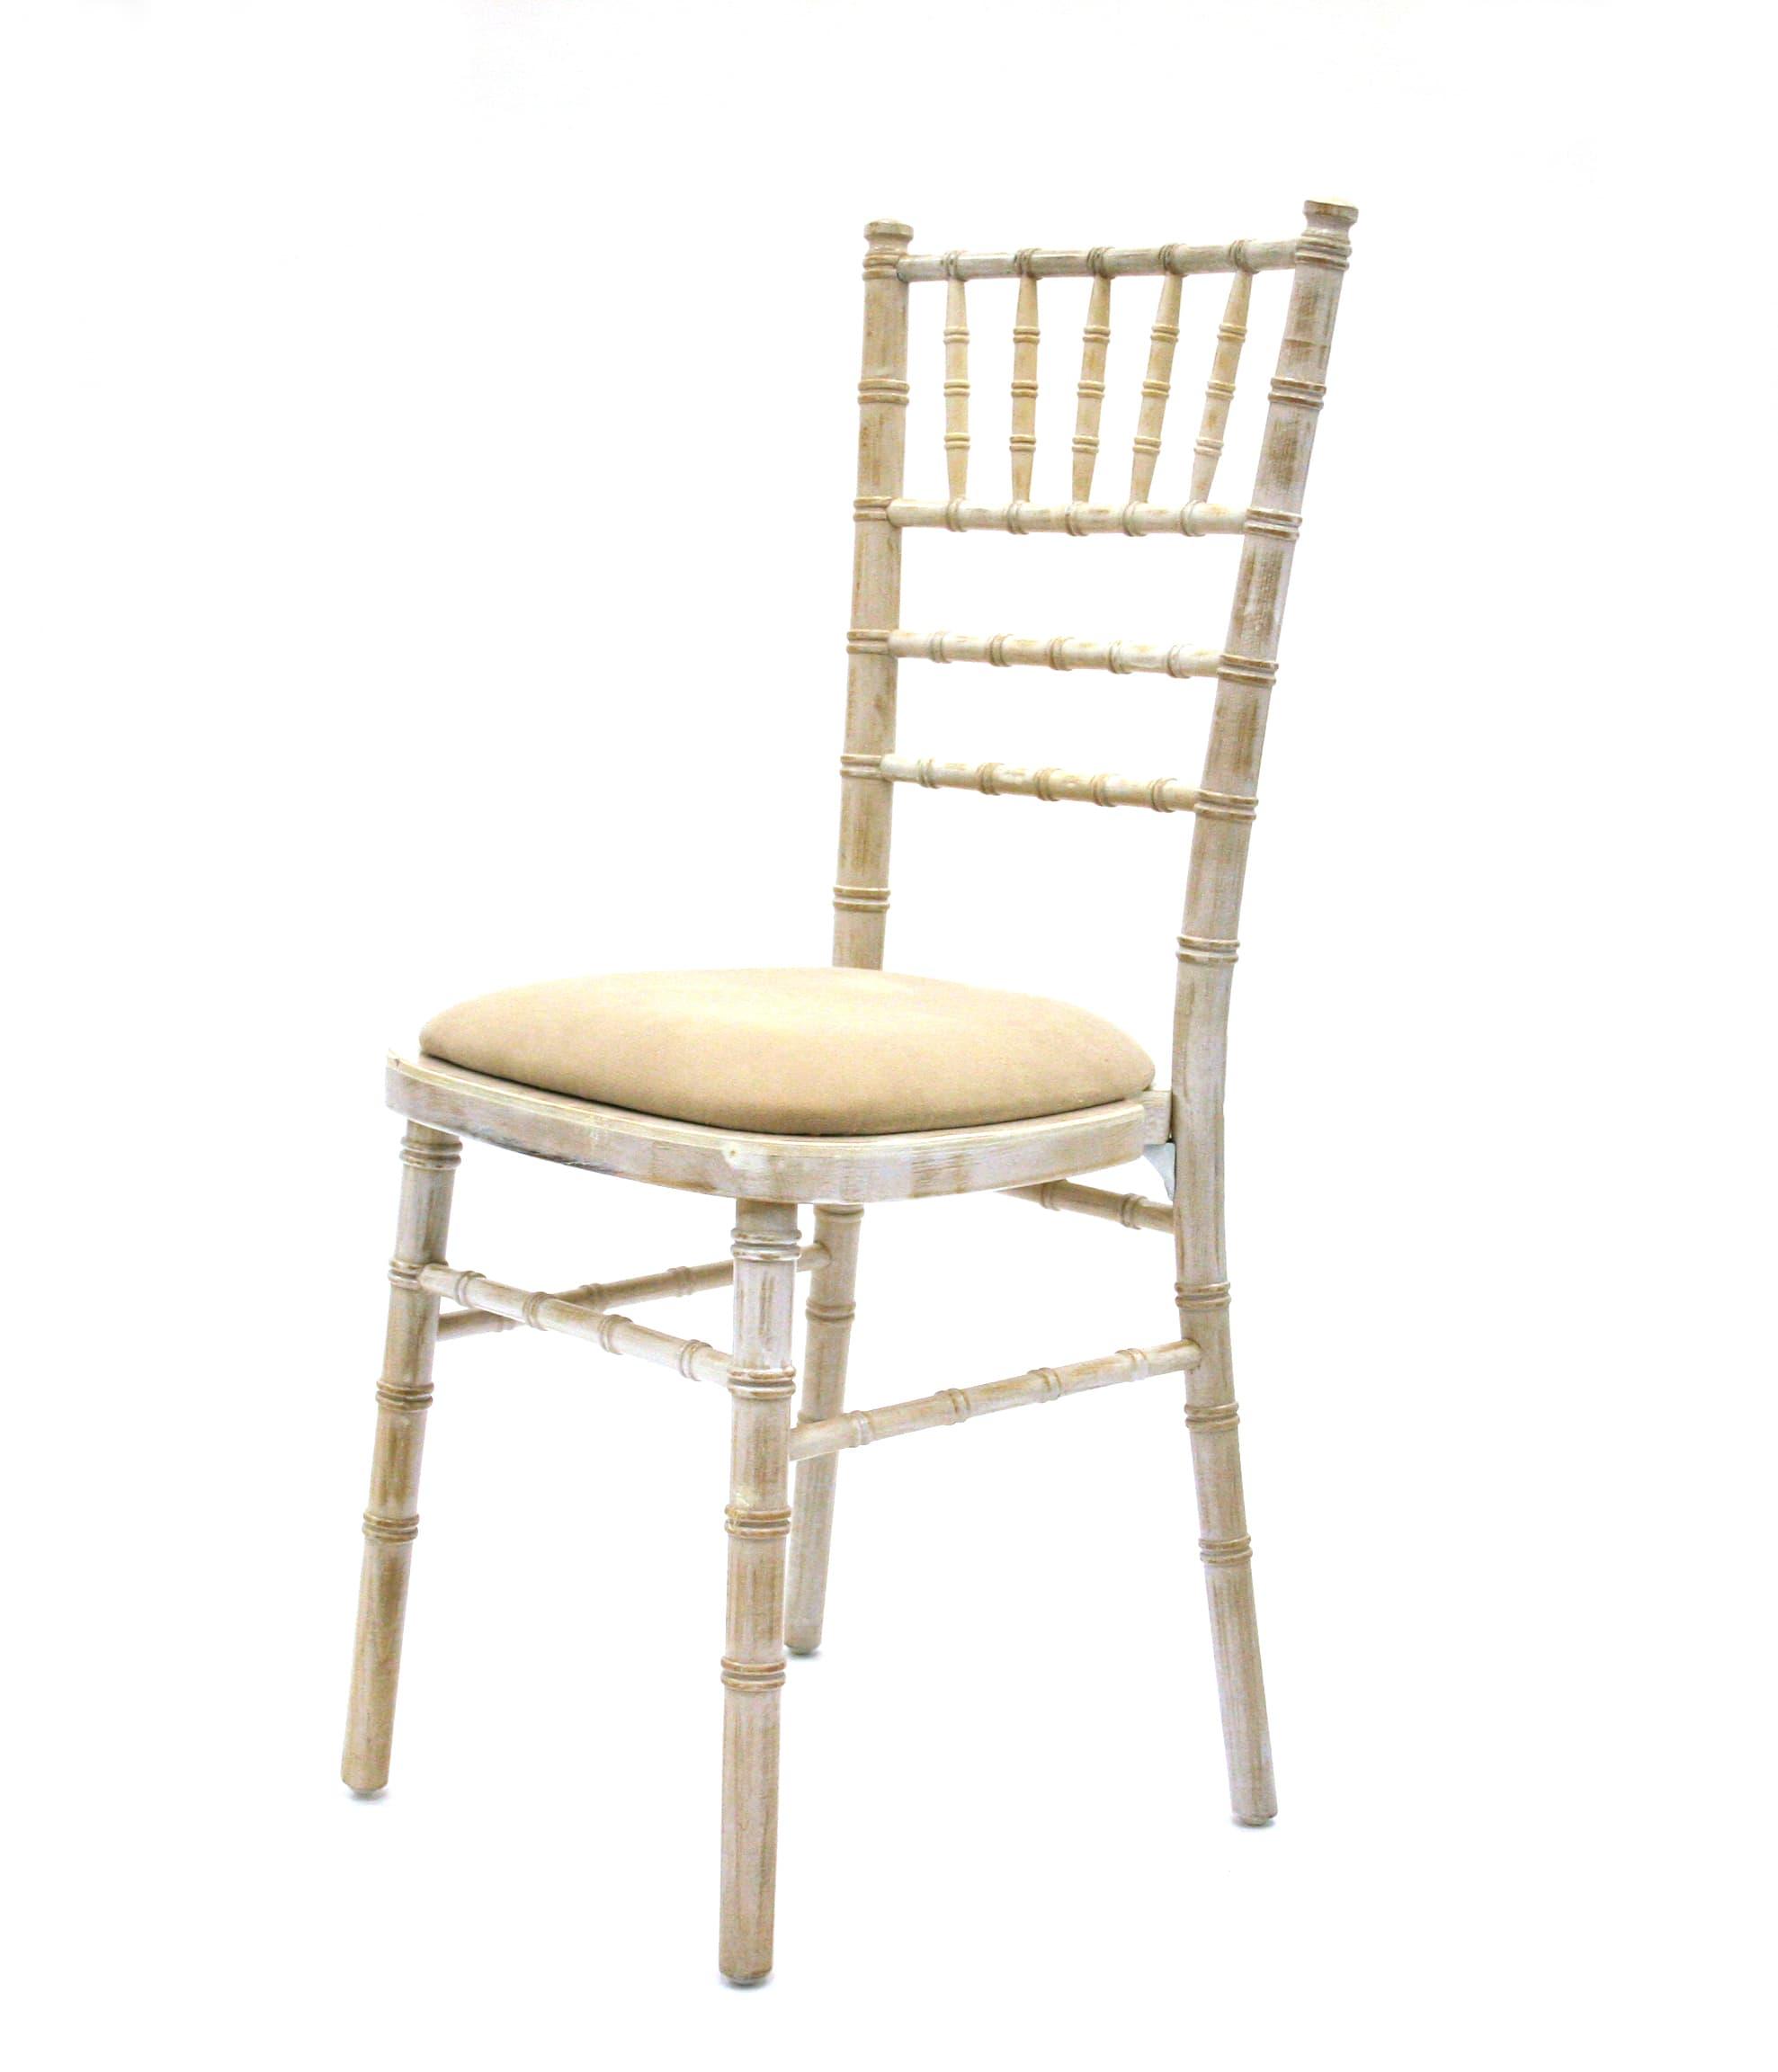 Limewash Chiavari Chairs - BE Furniture Sales